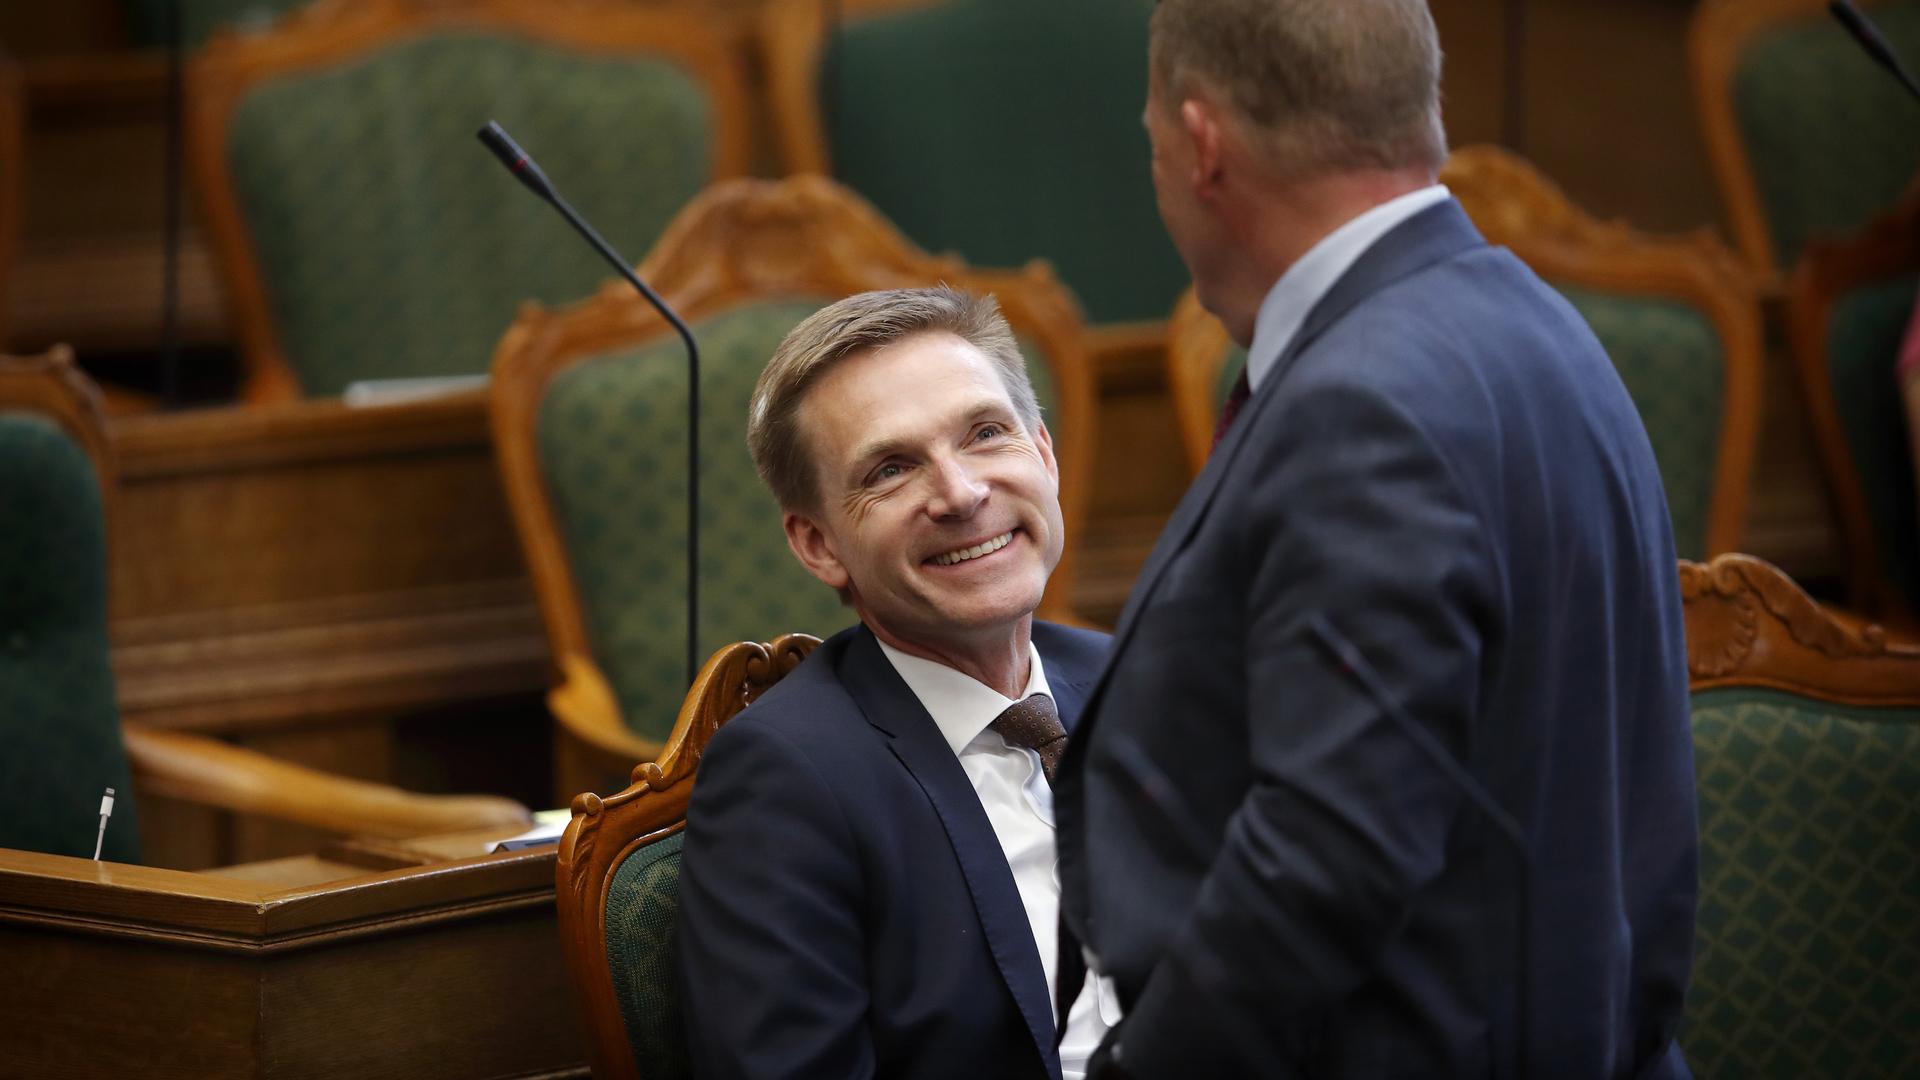 Professor Peter Lauritsen om burkaforbuddet: Intet er for småt for et Christiansborg, der lader de virkelige problemer stå